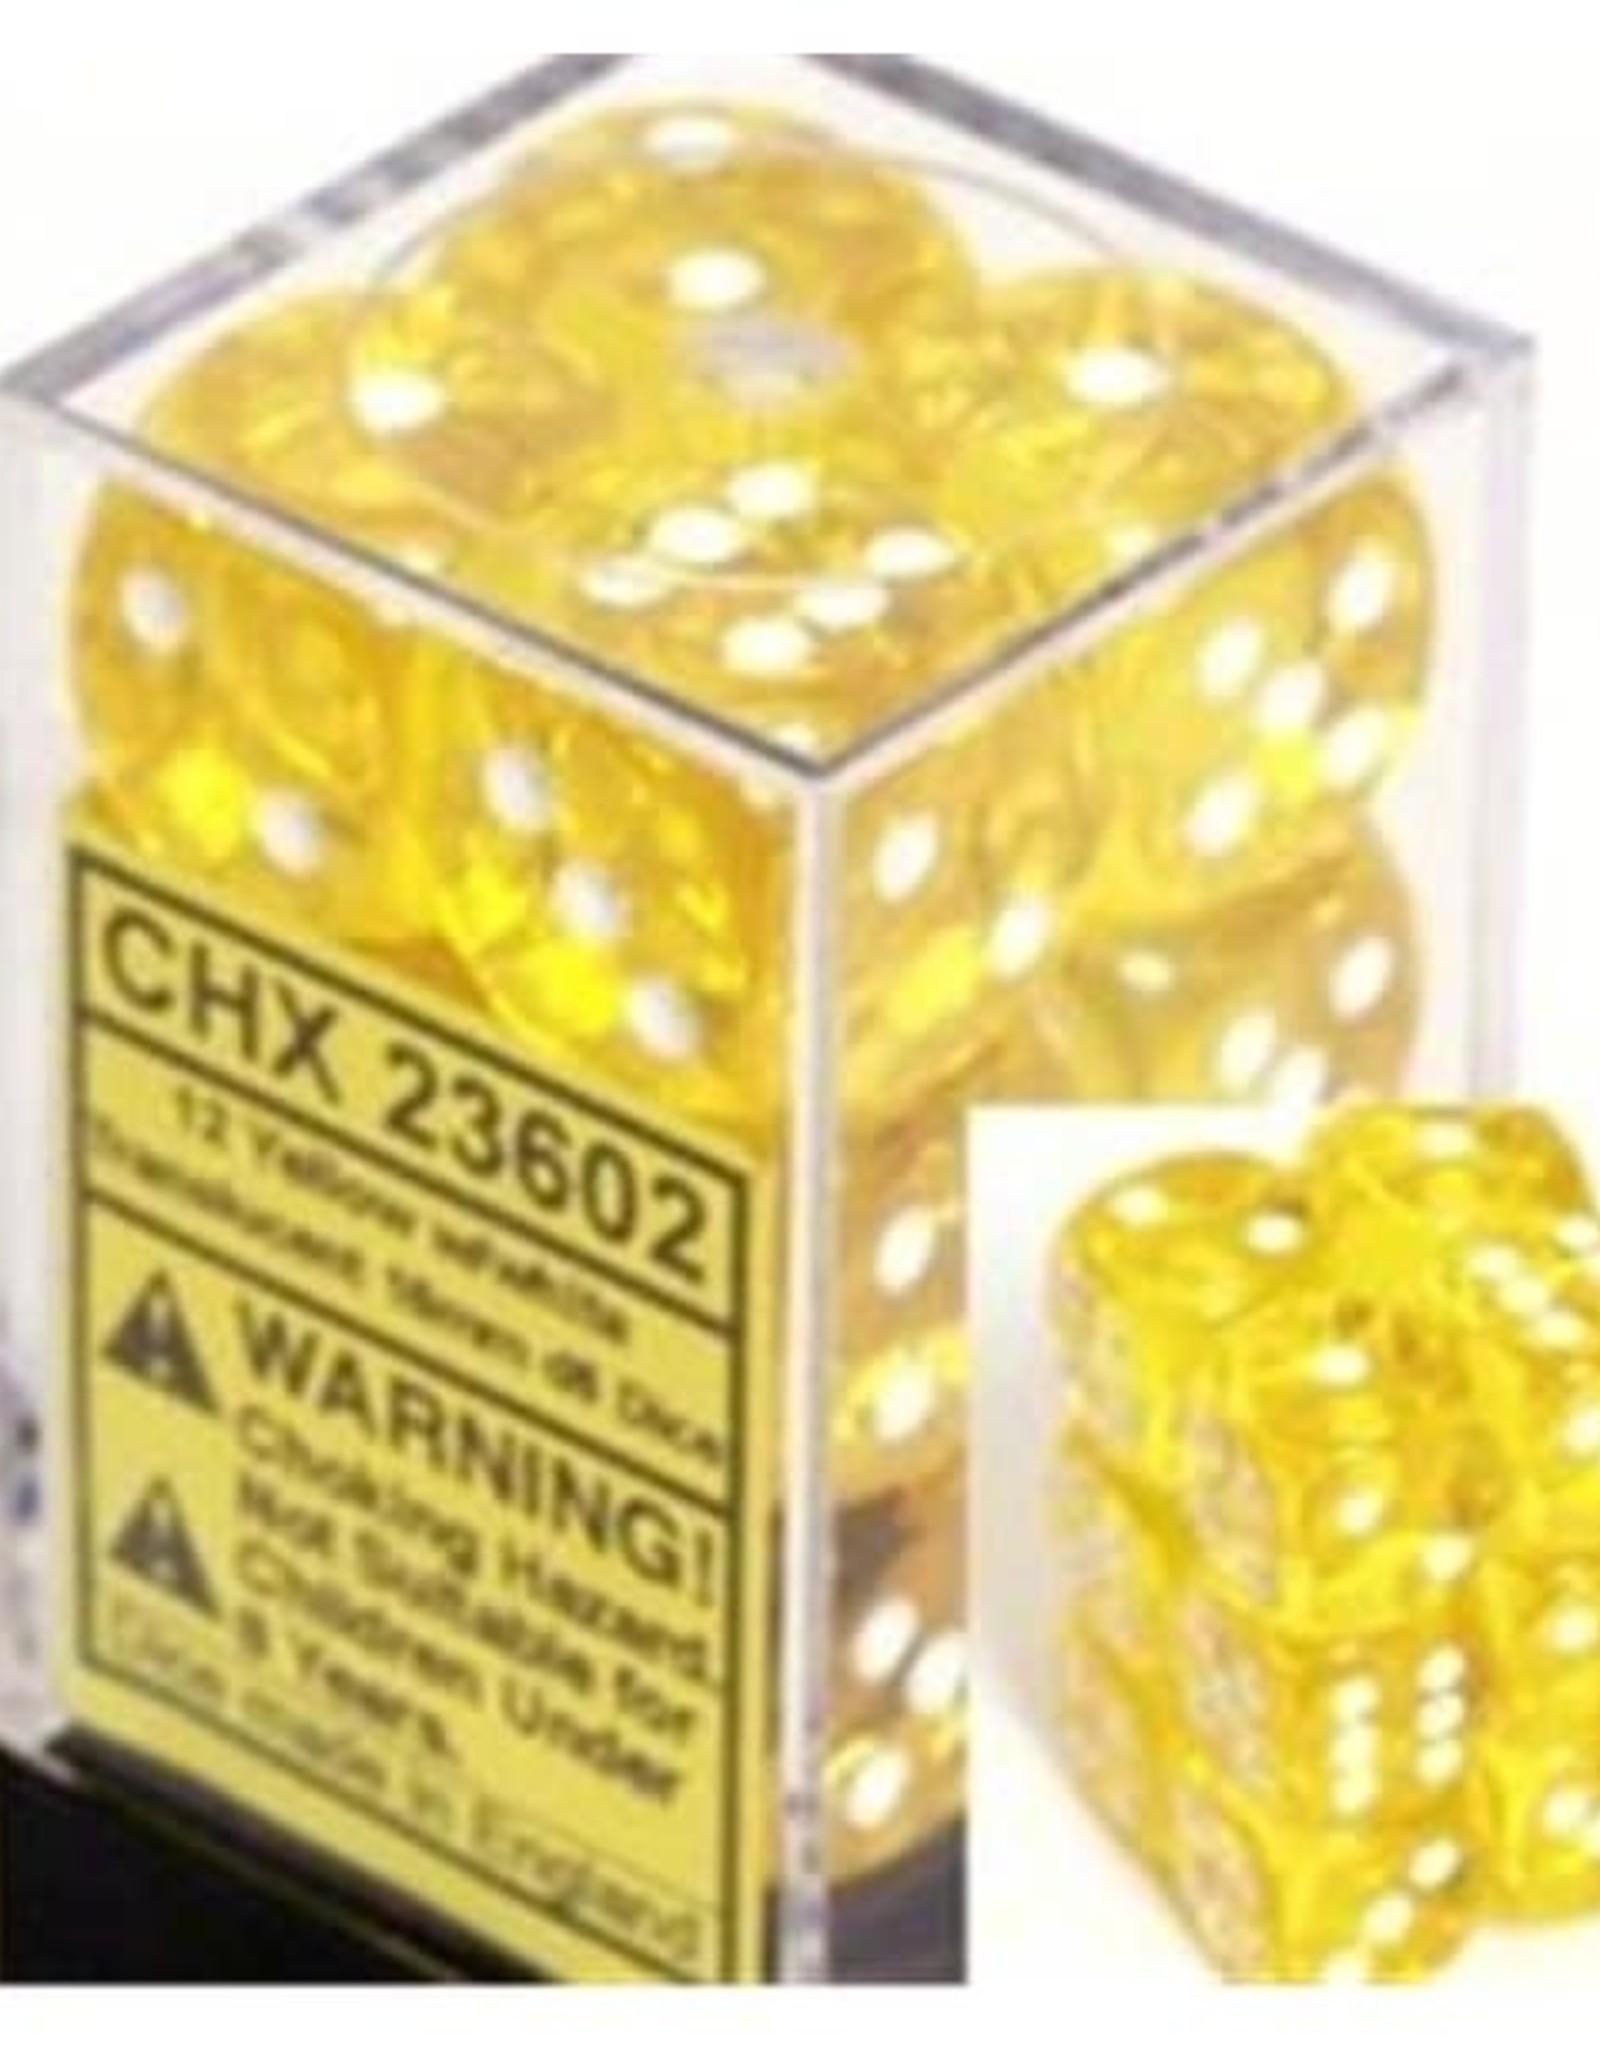 Chessex CHX23802 Chessex Translucent d6 Yellow & White Dice Block